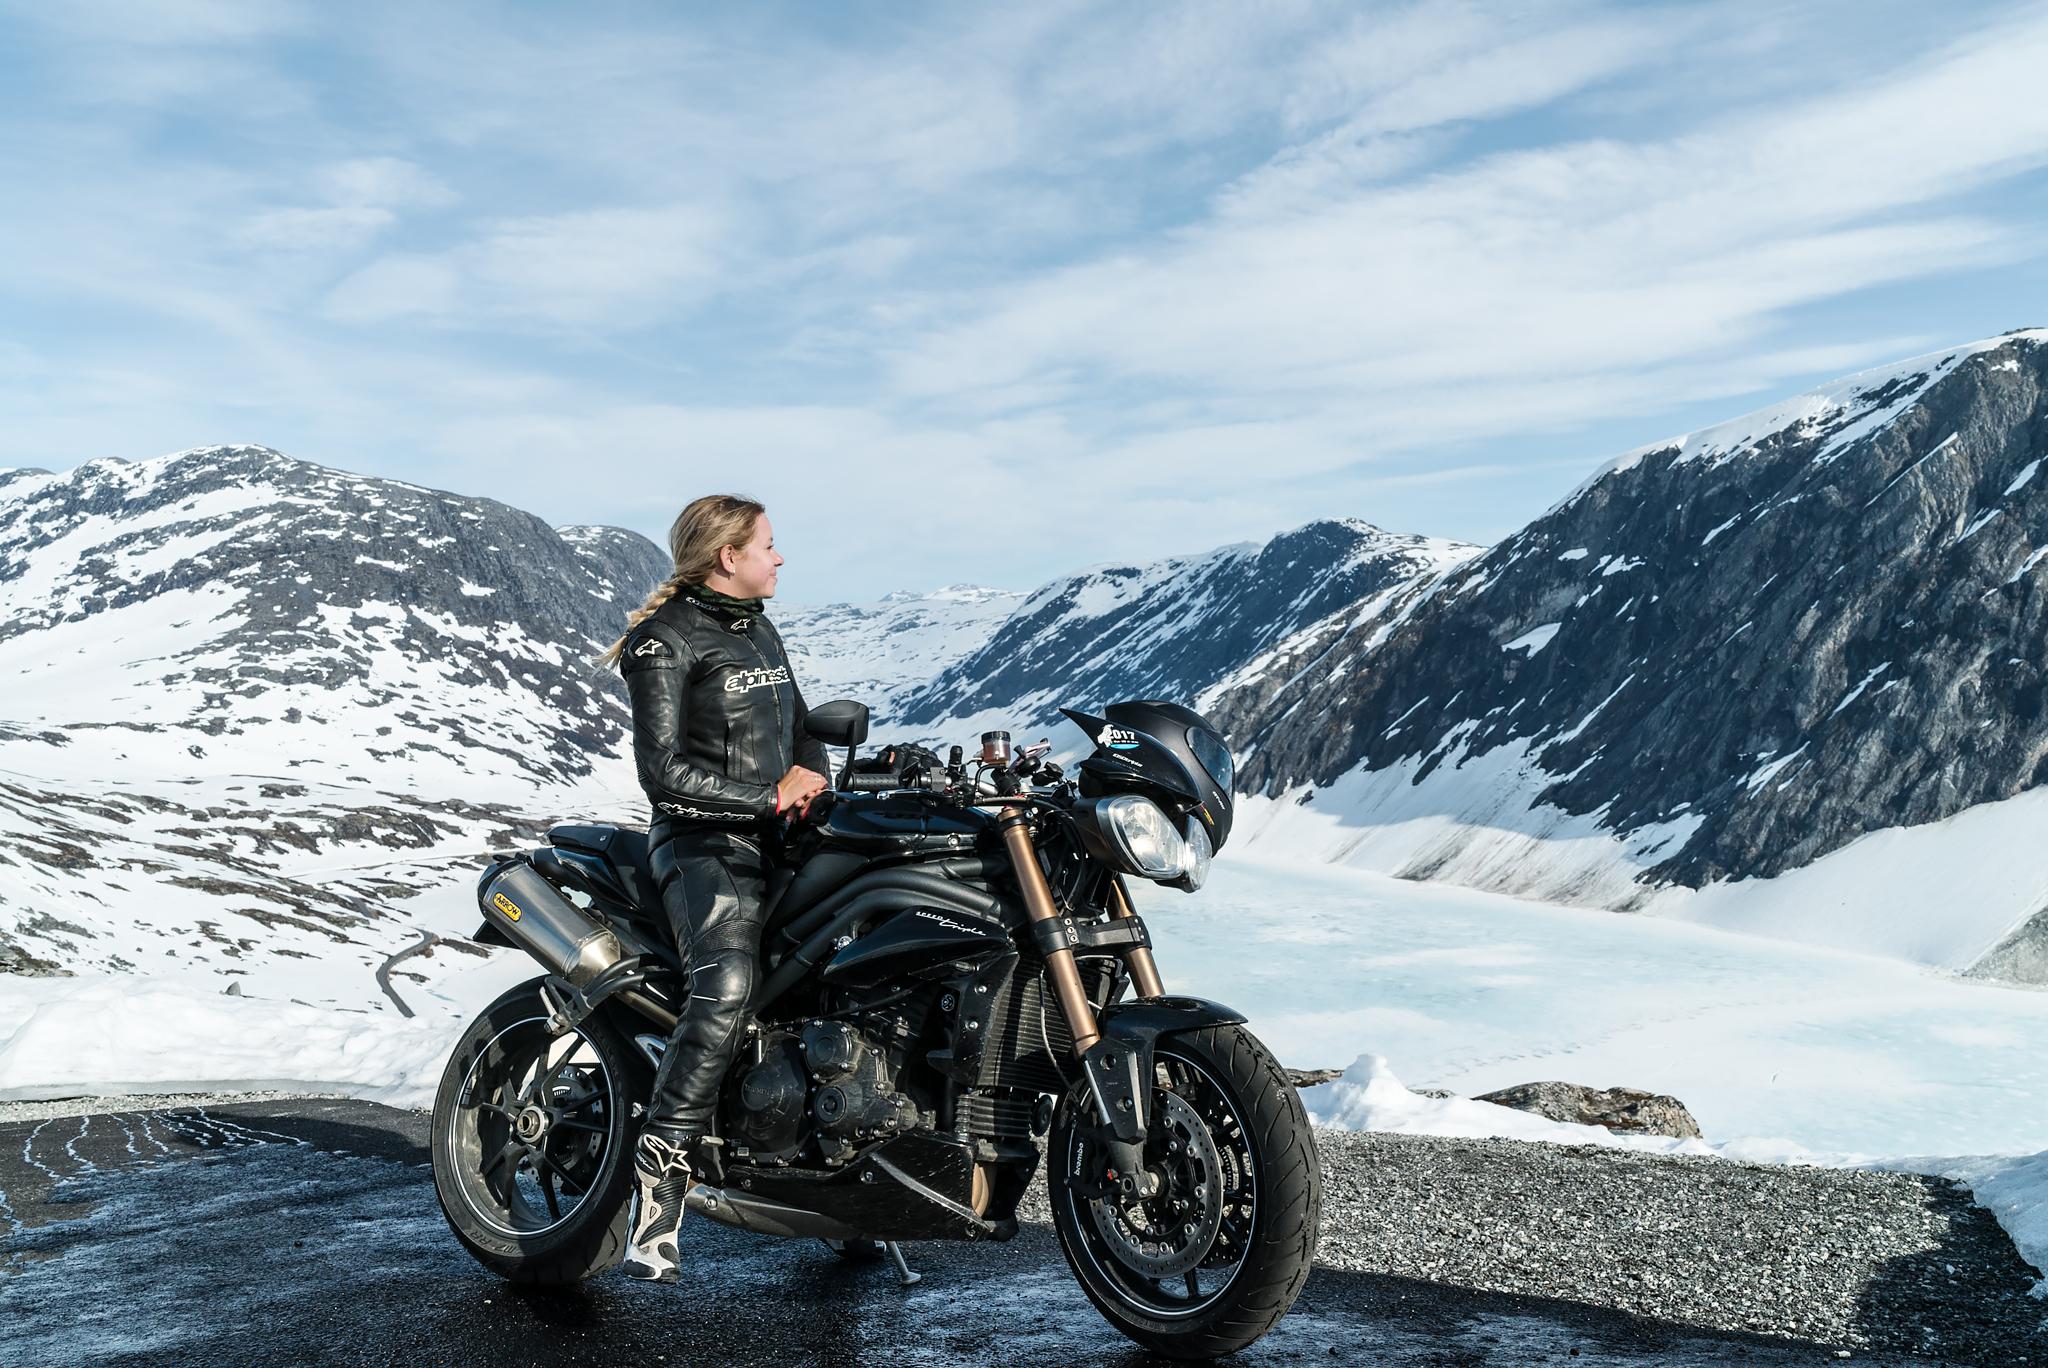 2017.05---82.-stryn-alexandra-motorcykeln-geiranger.jpg